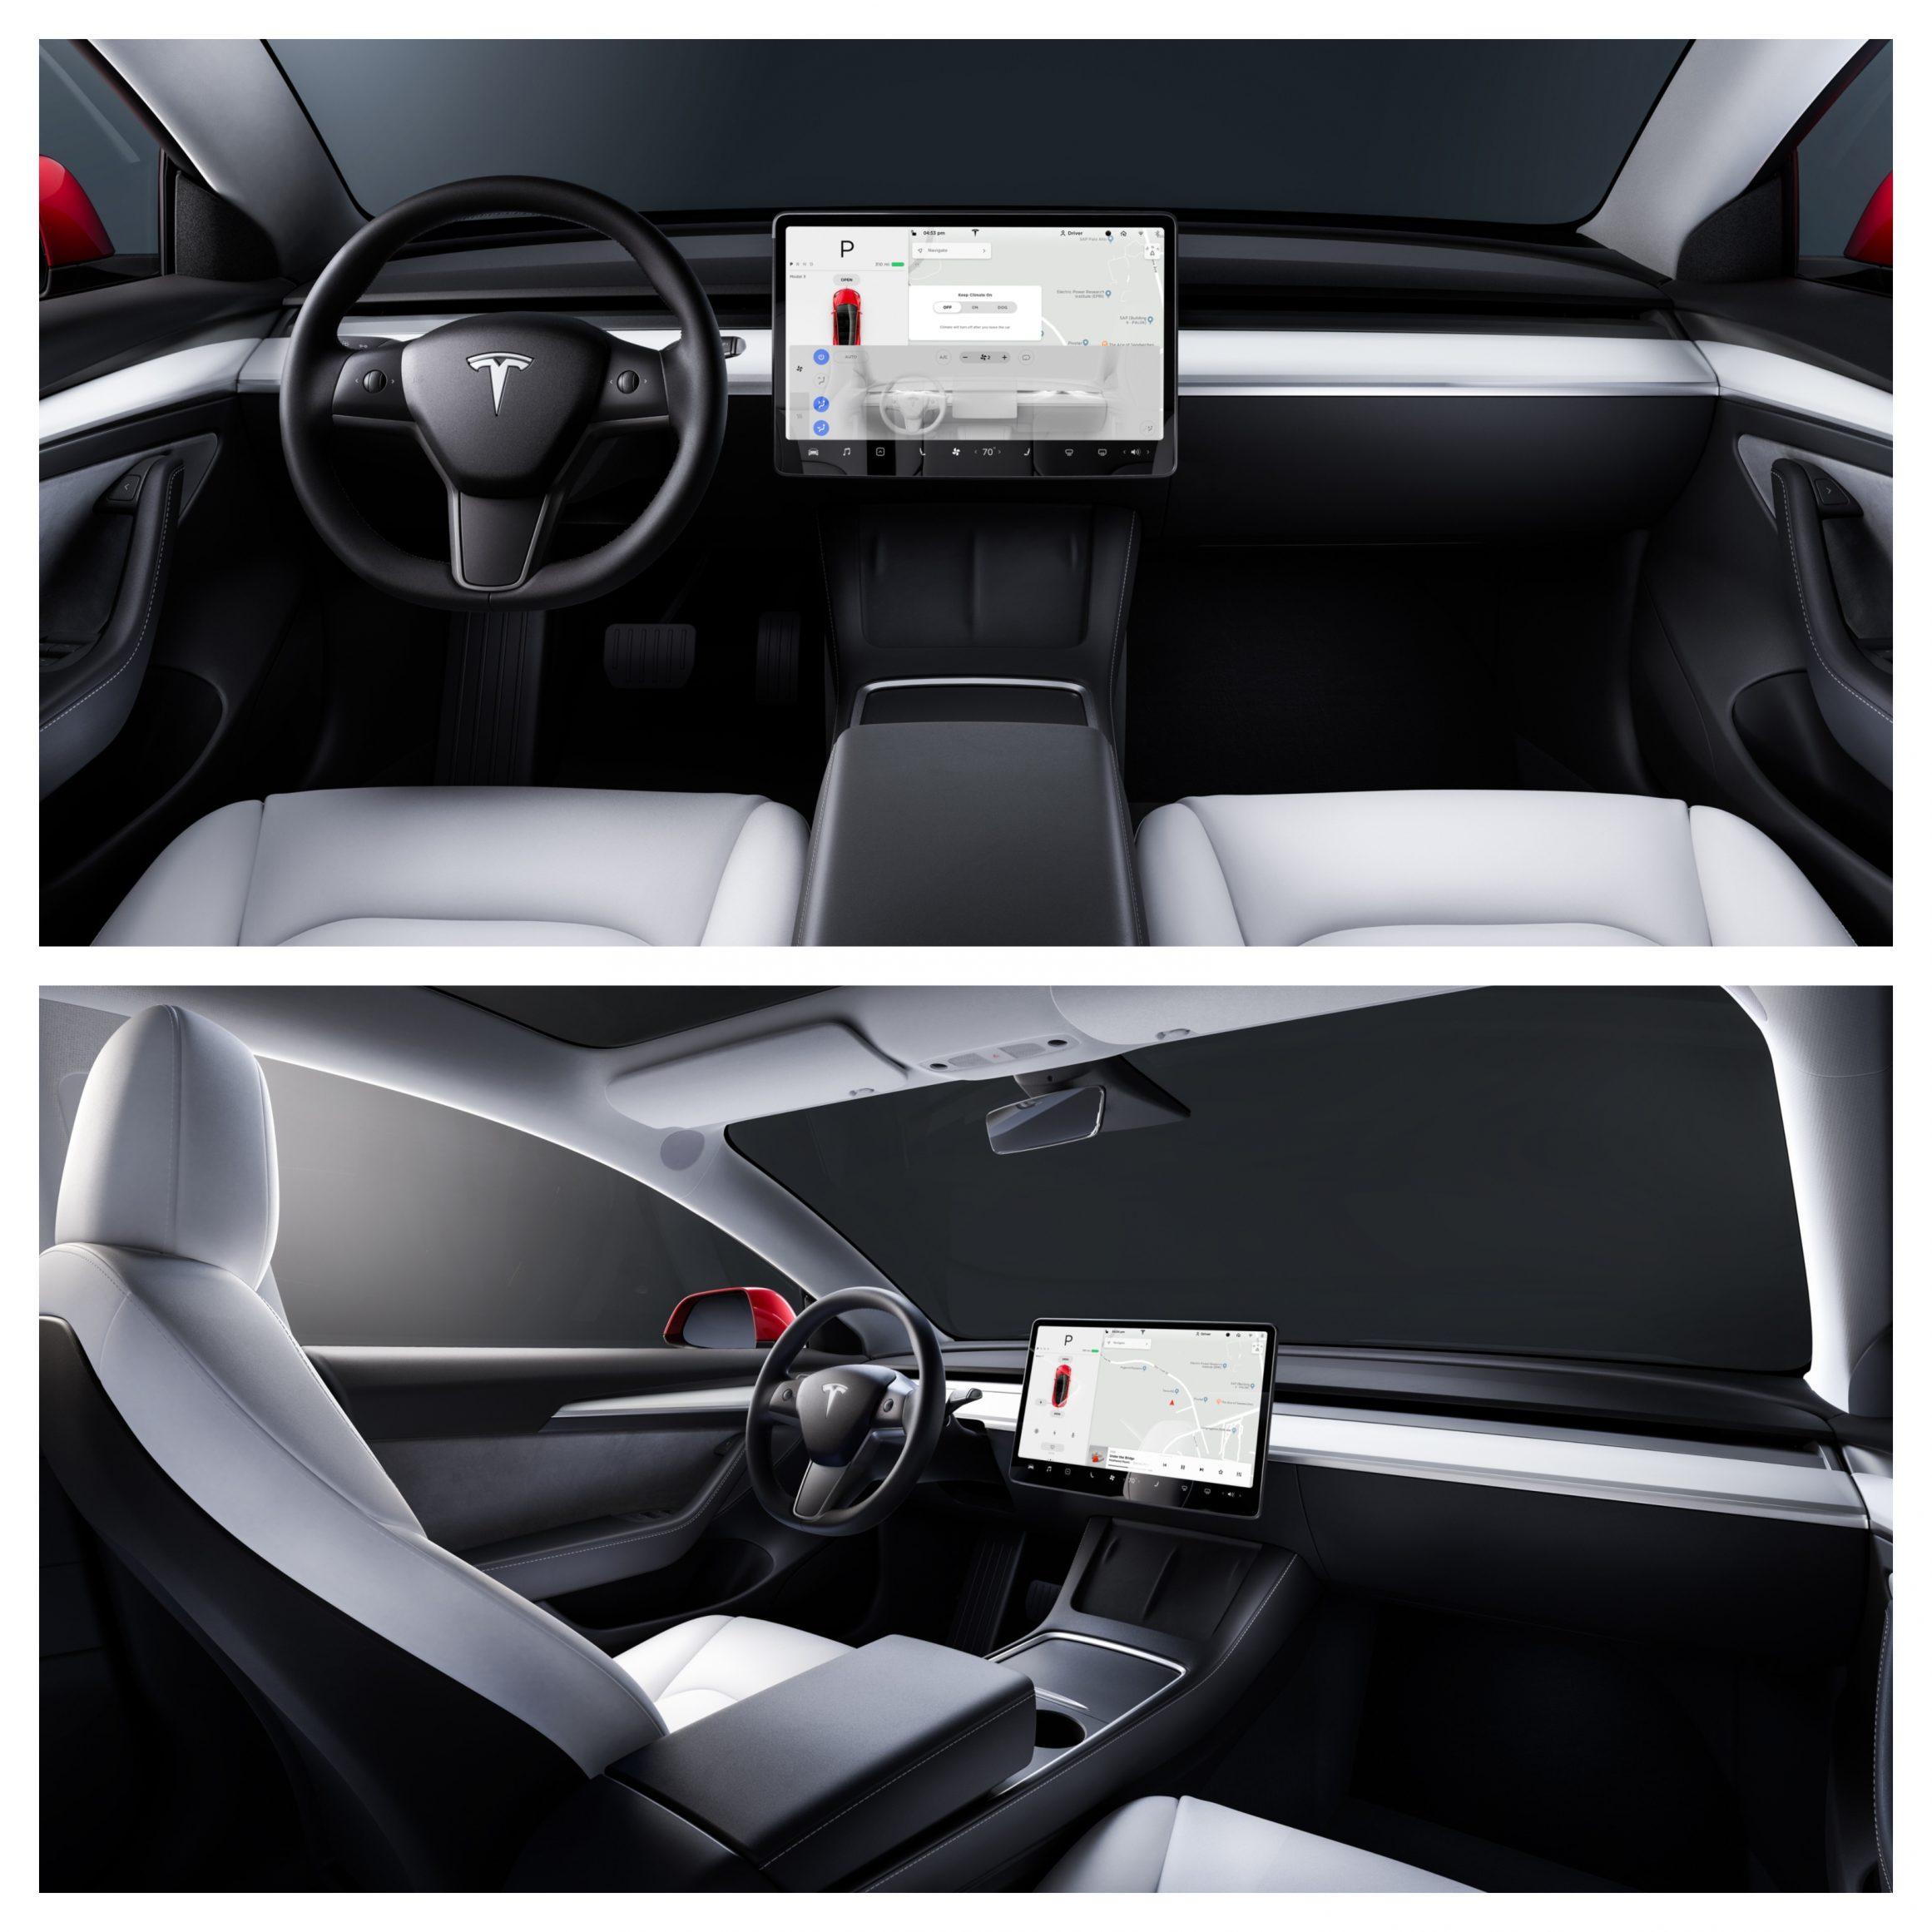 2021 Tesla Model 3 interior